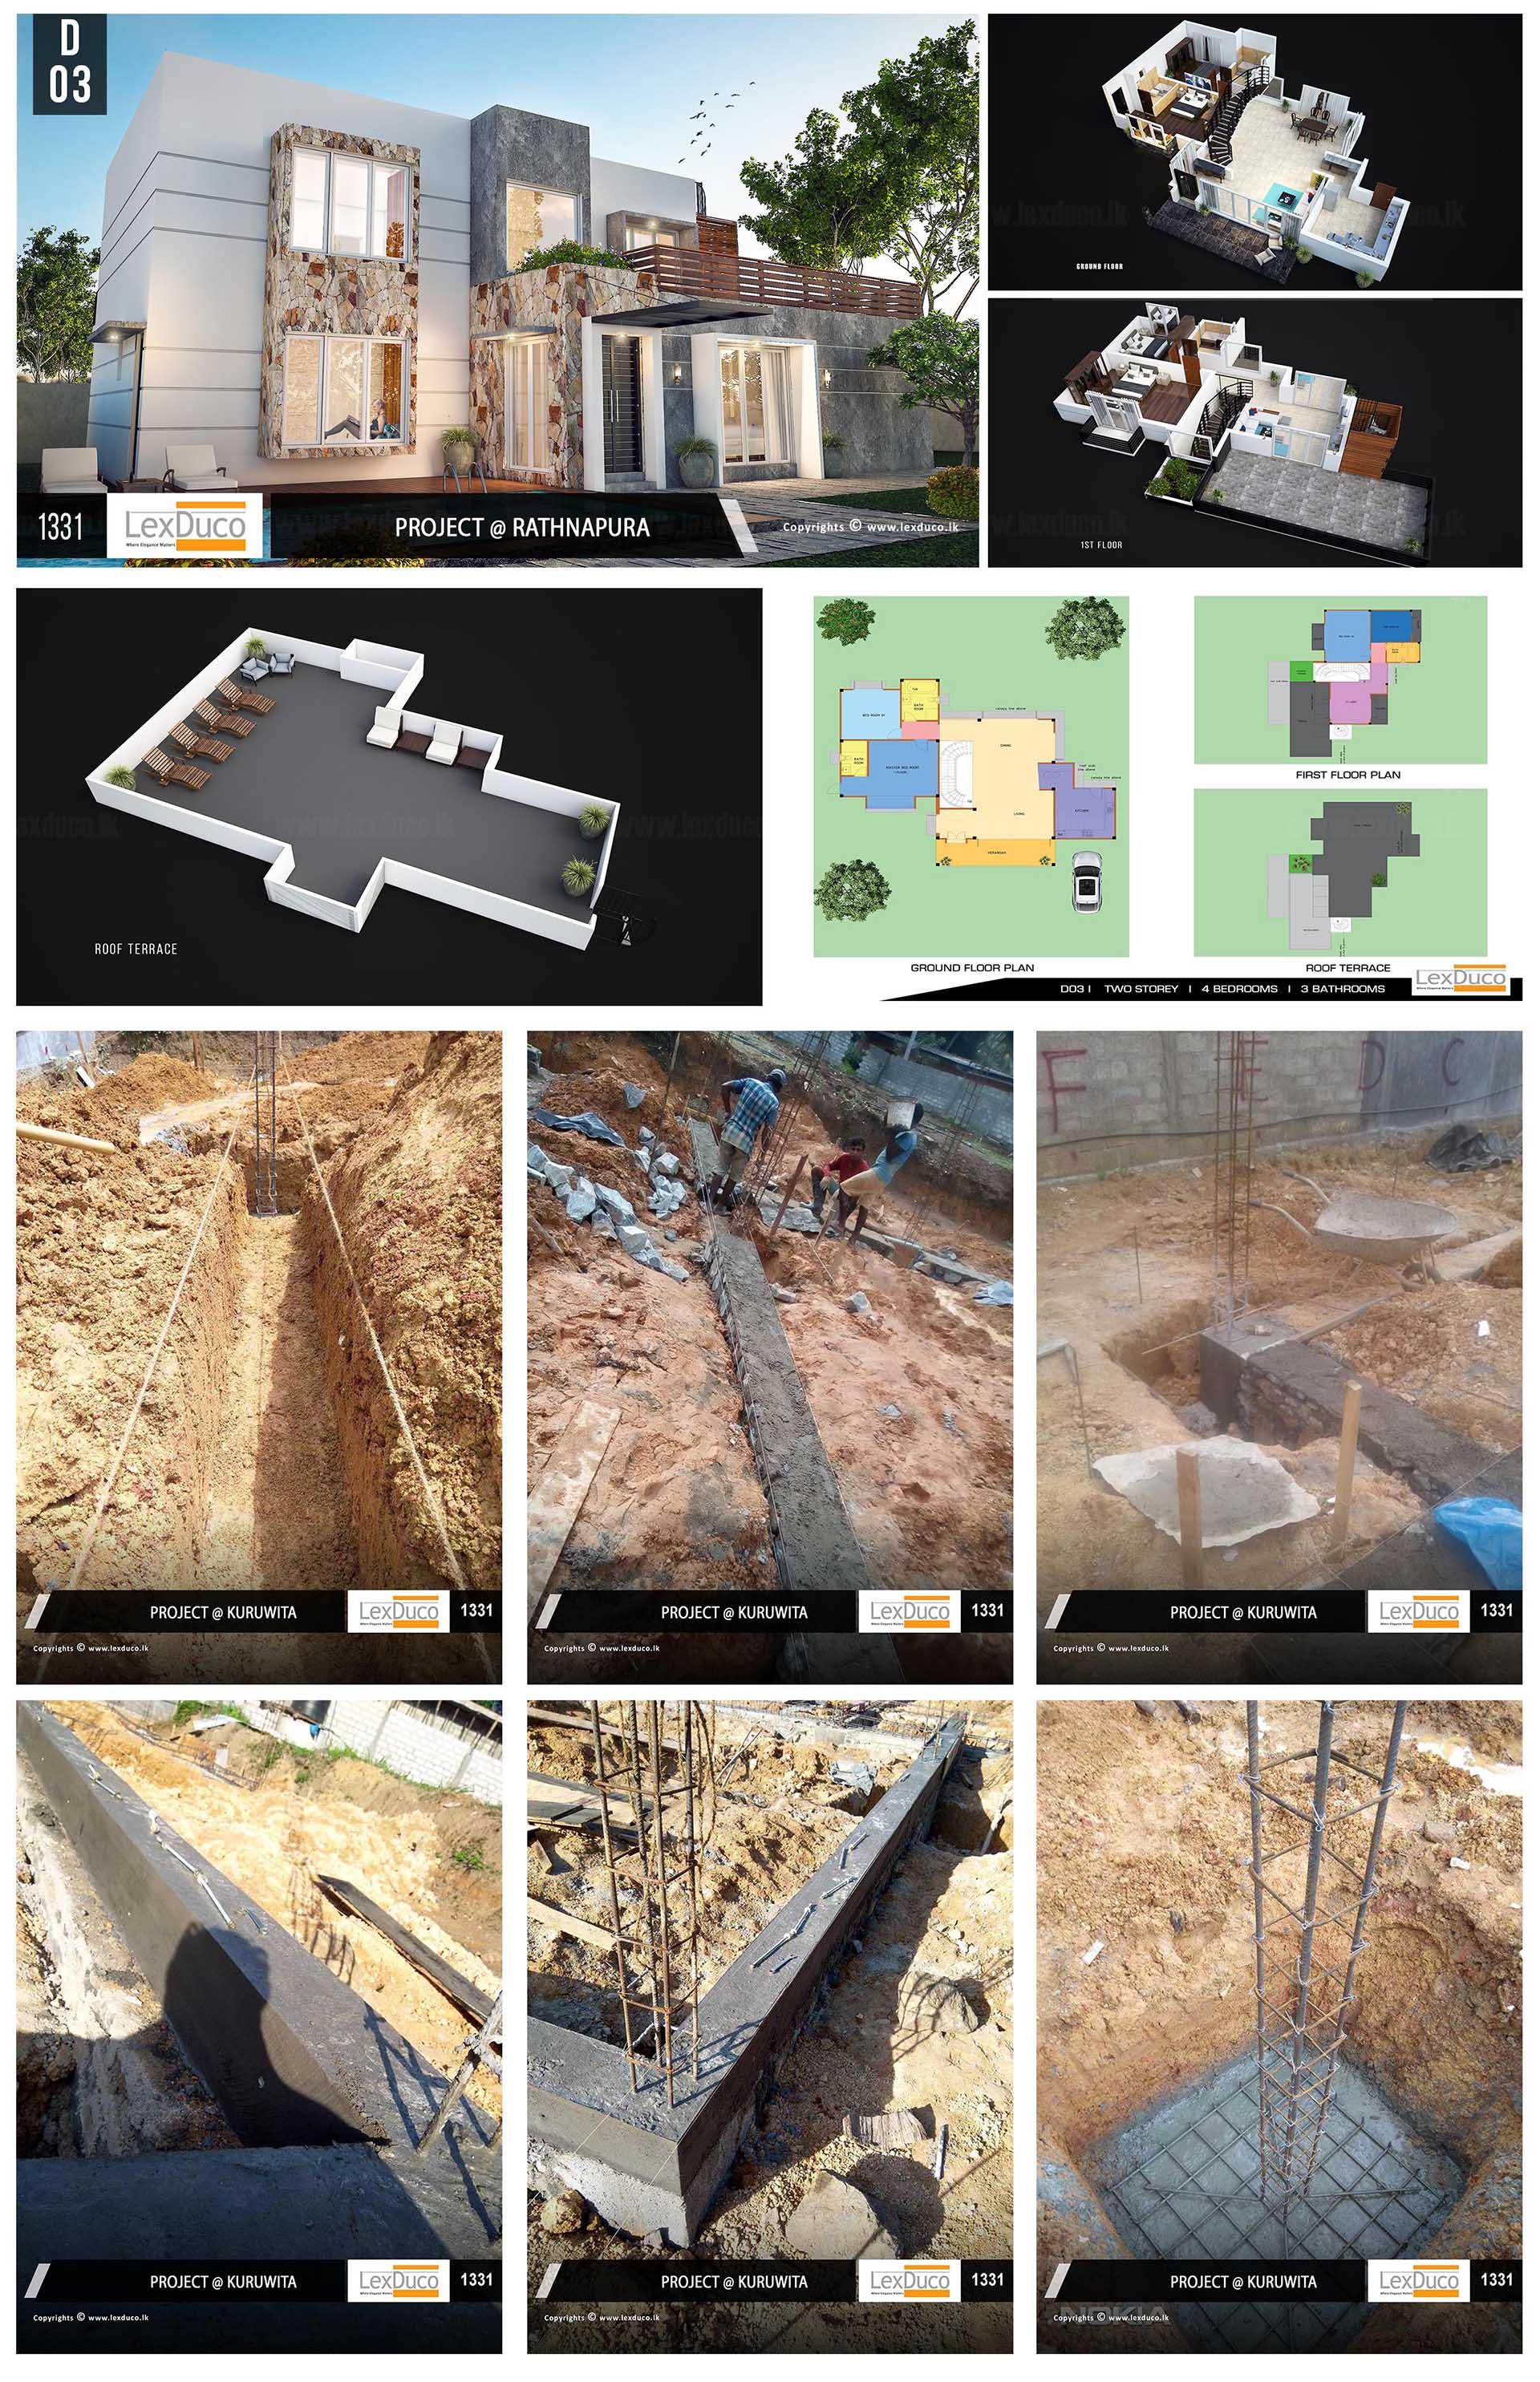 Residential Housing Project at Kuruwita | Lex Duco